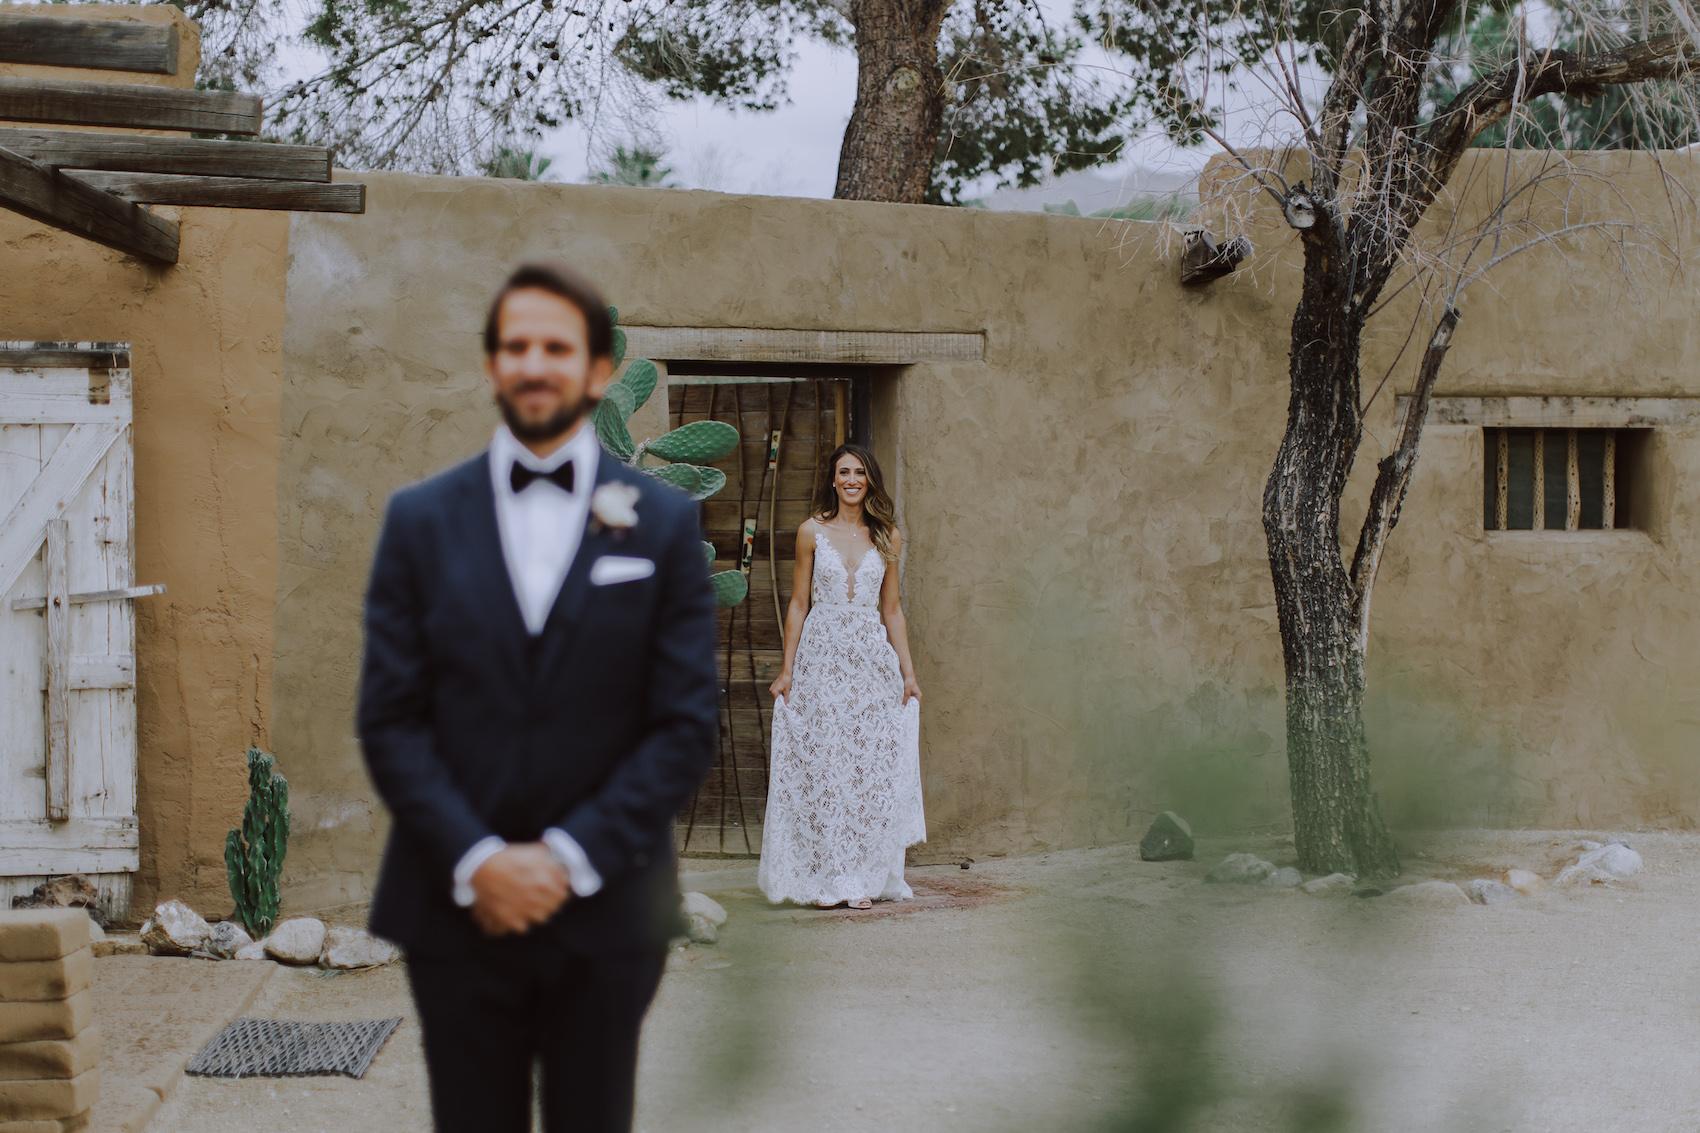 29-Palms-Inn-Joshua-Tree-Jewish-Wedding-H+M-17.jpg